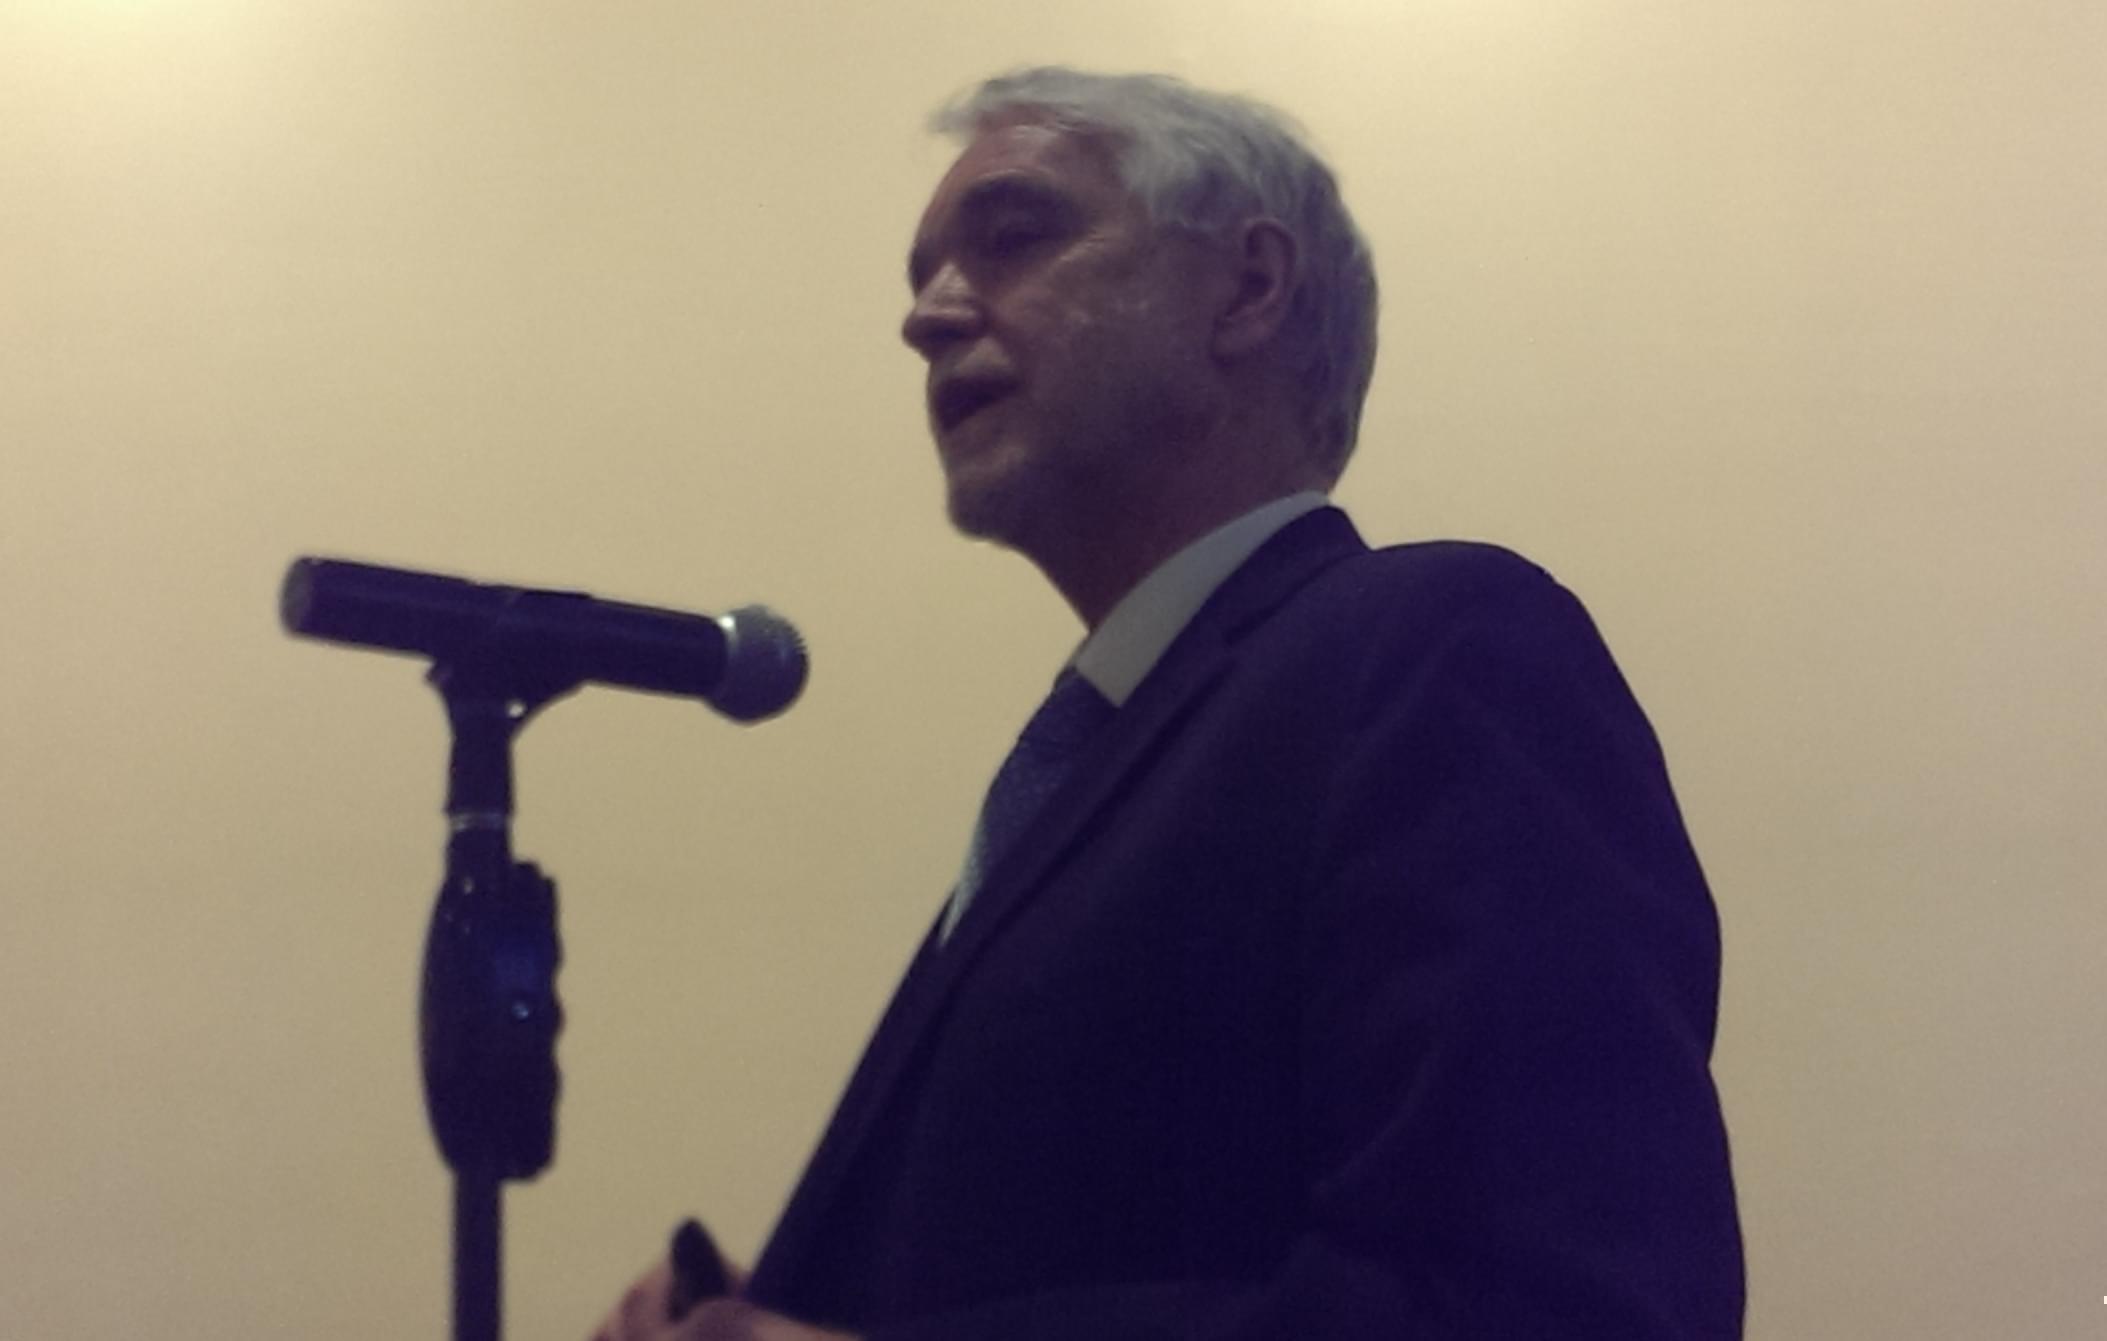 U of I President Tim Killeen speaks at Monday's Urbana campus Academic Senate meeting at the Illini Union.